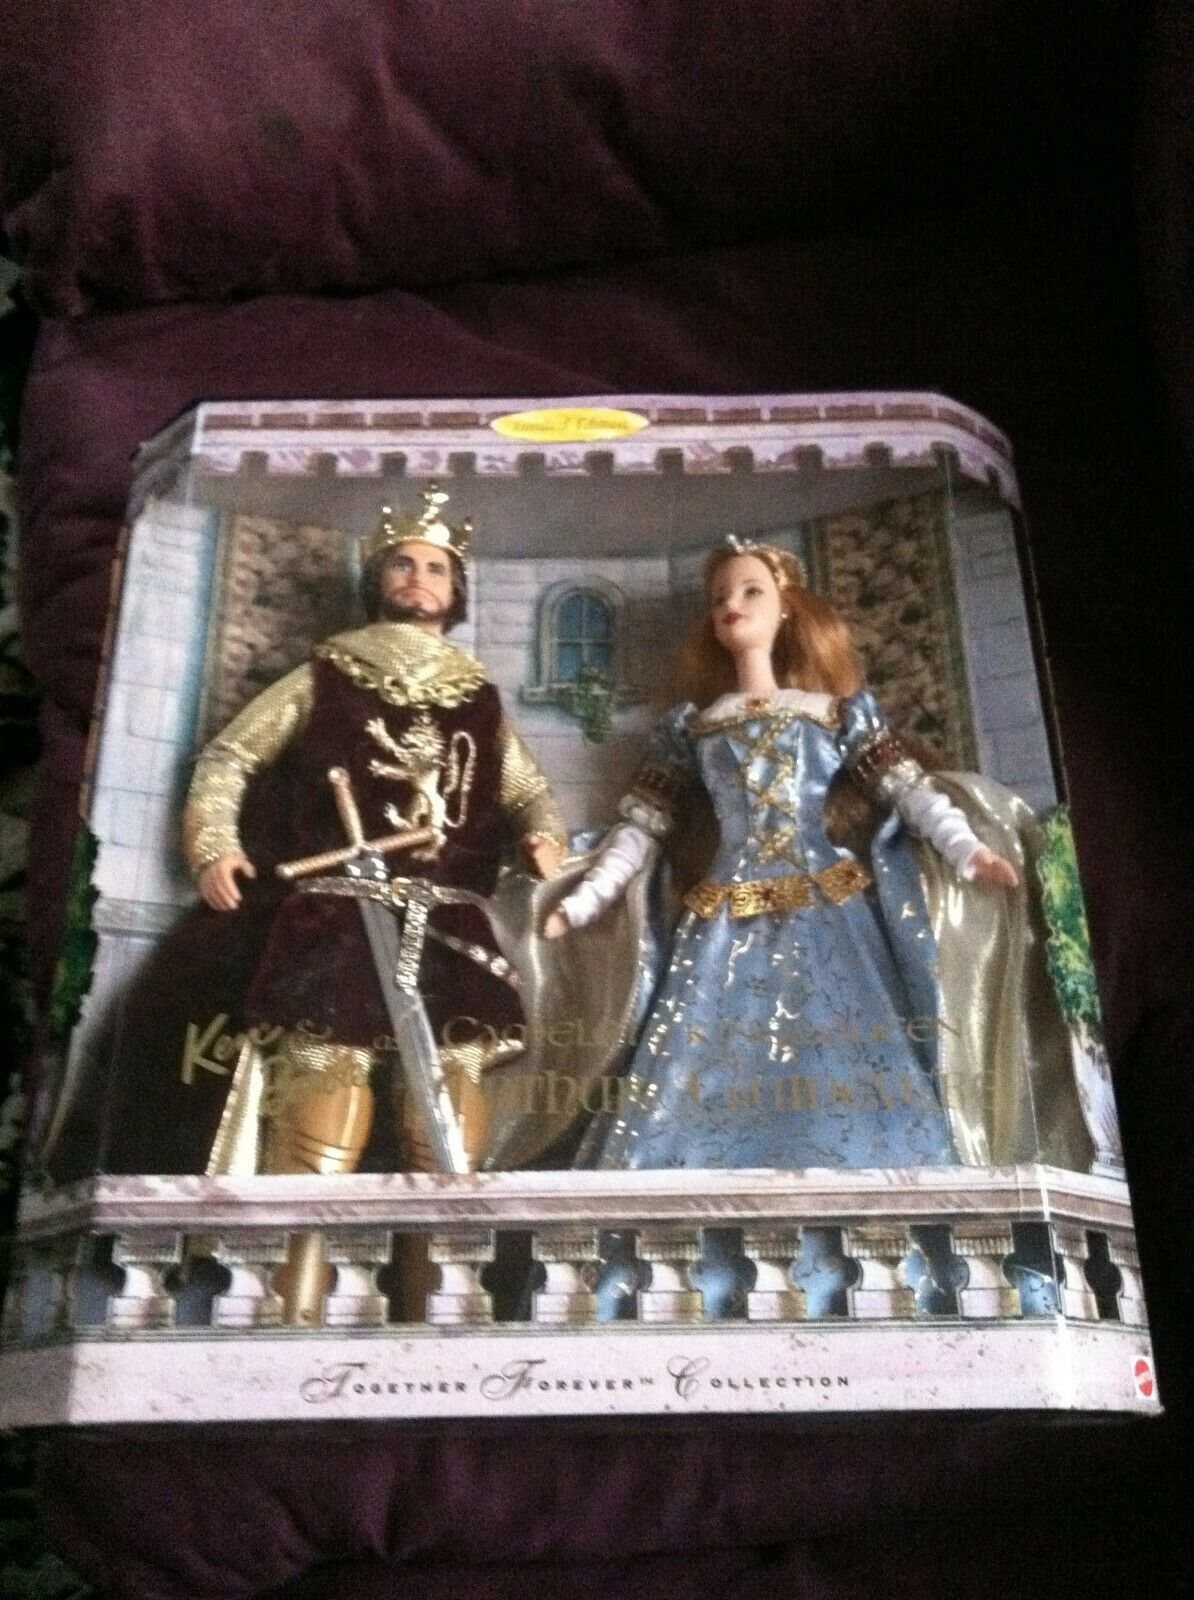 Barbie Ken Camelot's Rey Arturo Reina Guinevere Giftset Muñeca 23880 juntos